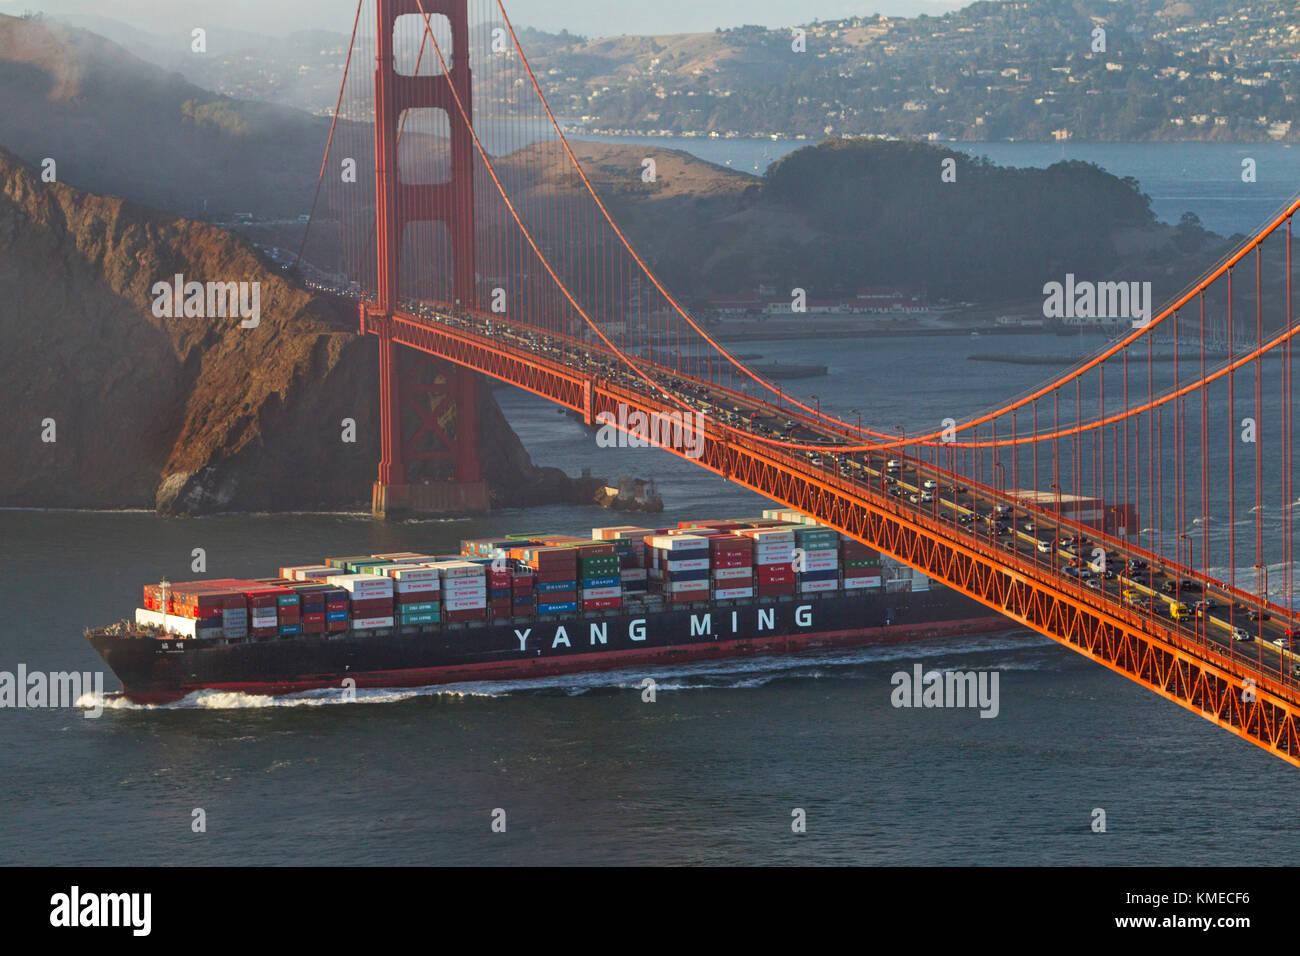 Freighter sailing under Golden Gate Bridge in San Francisco Bay, San Francisco, California, USA - Stock Image